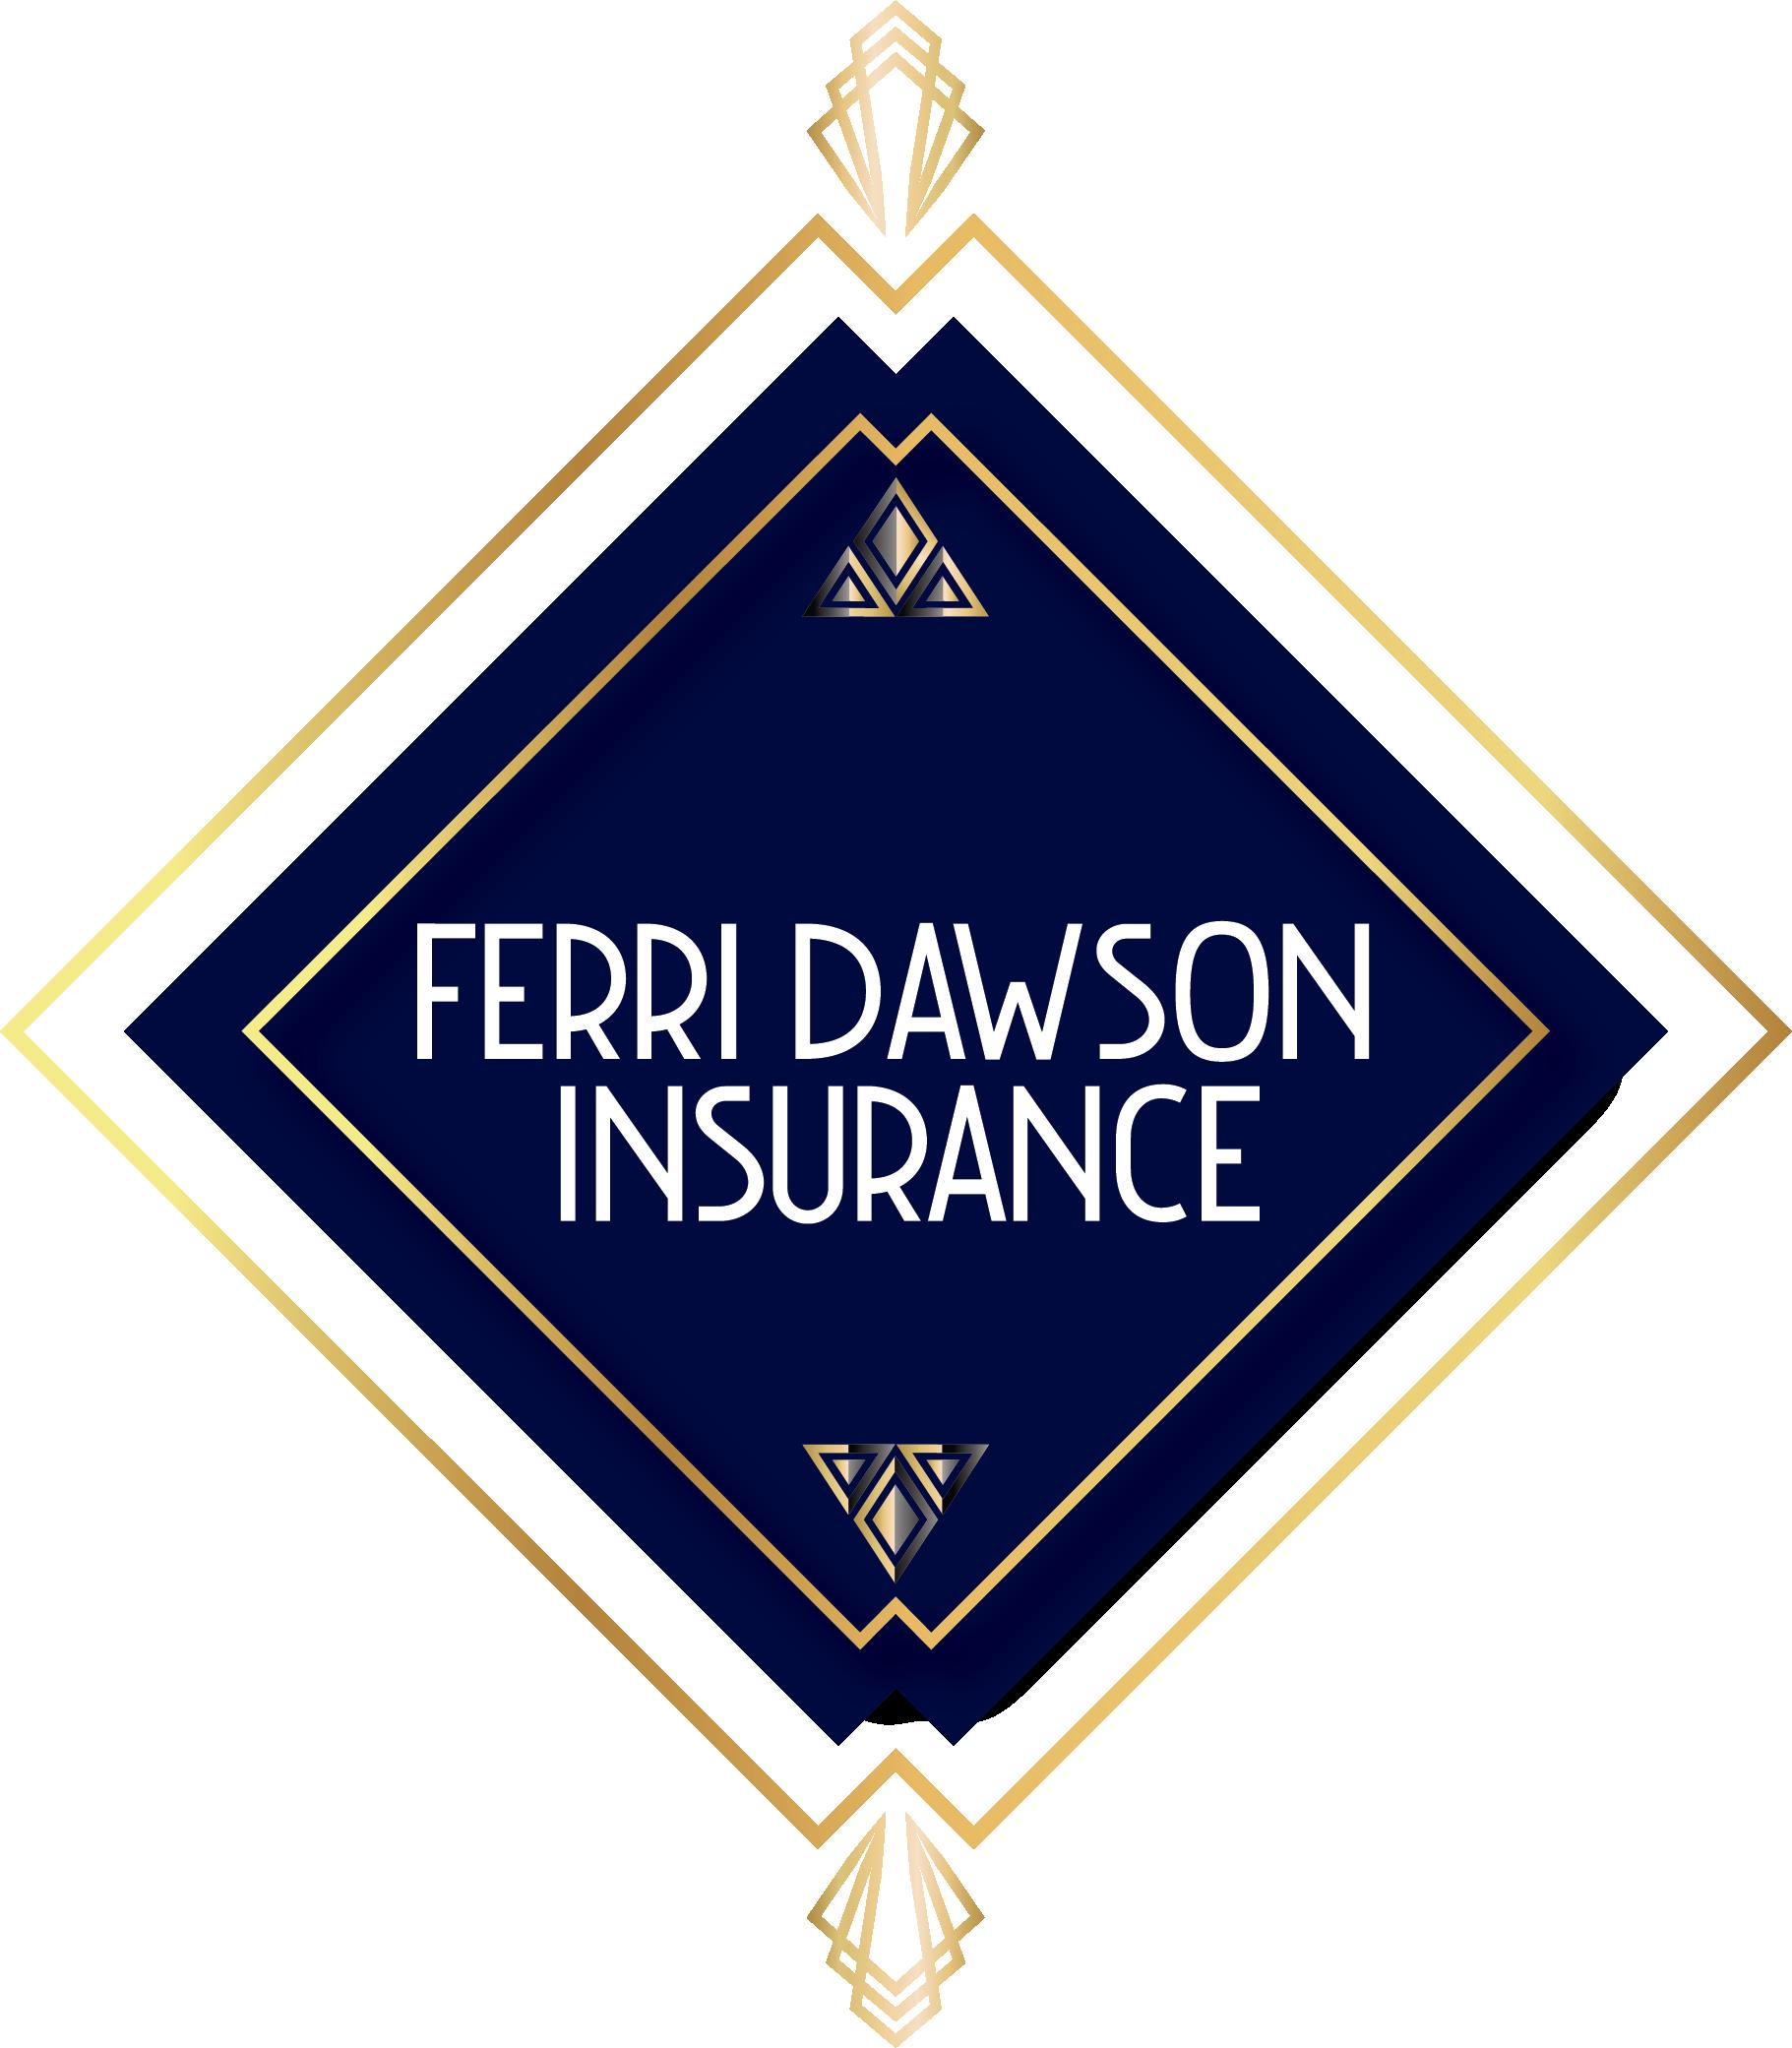 Ferri Dawson Insurance Group